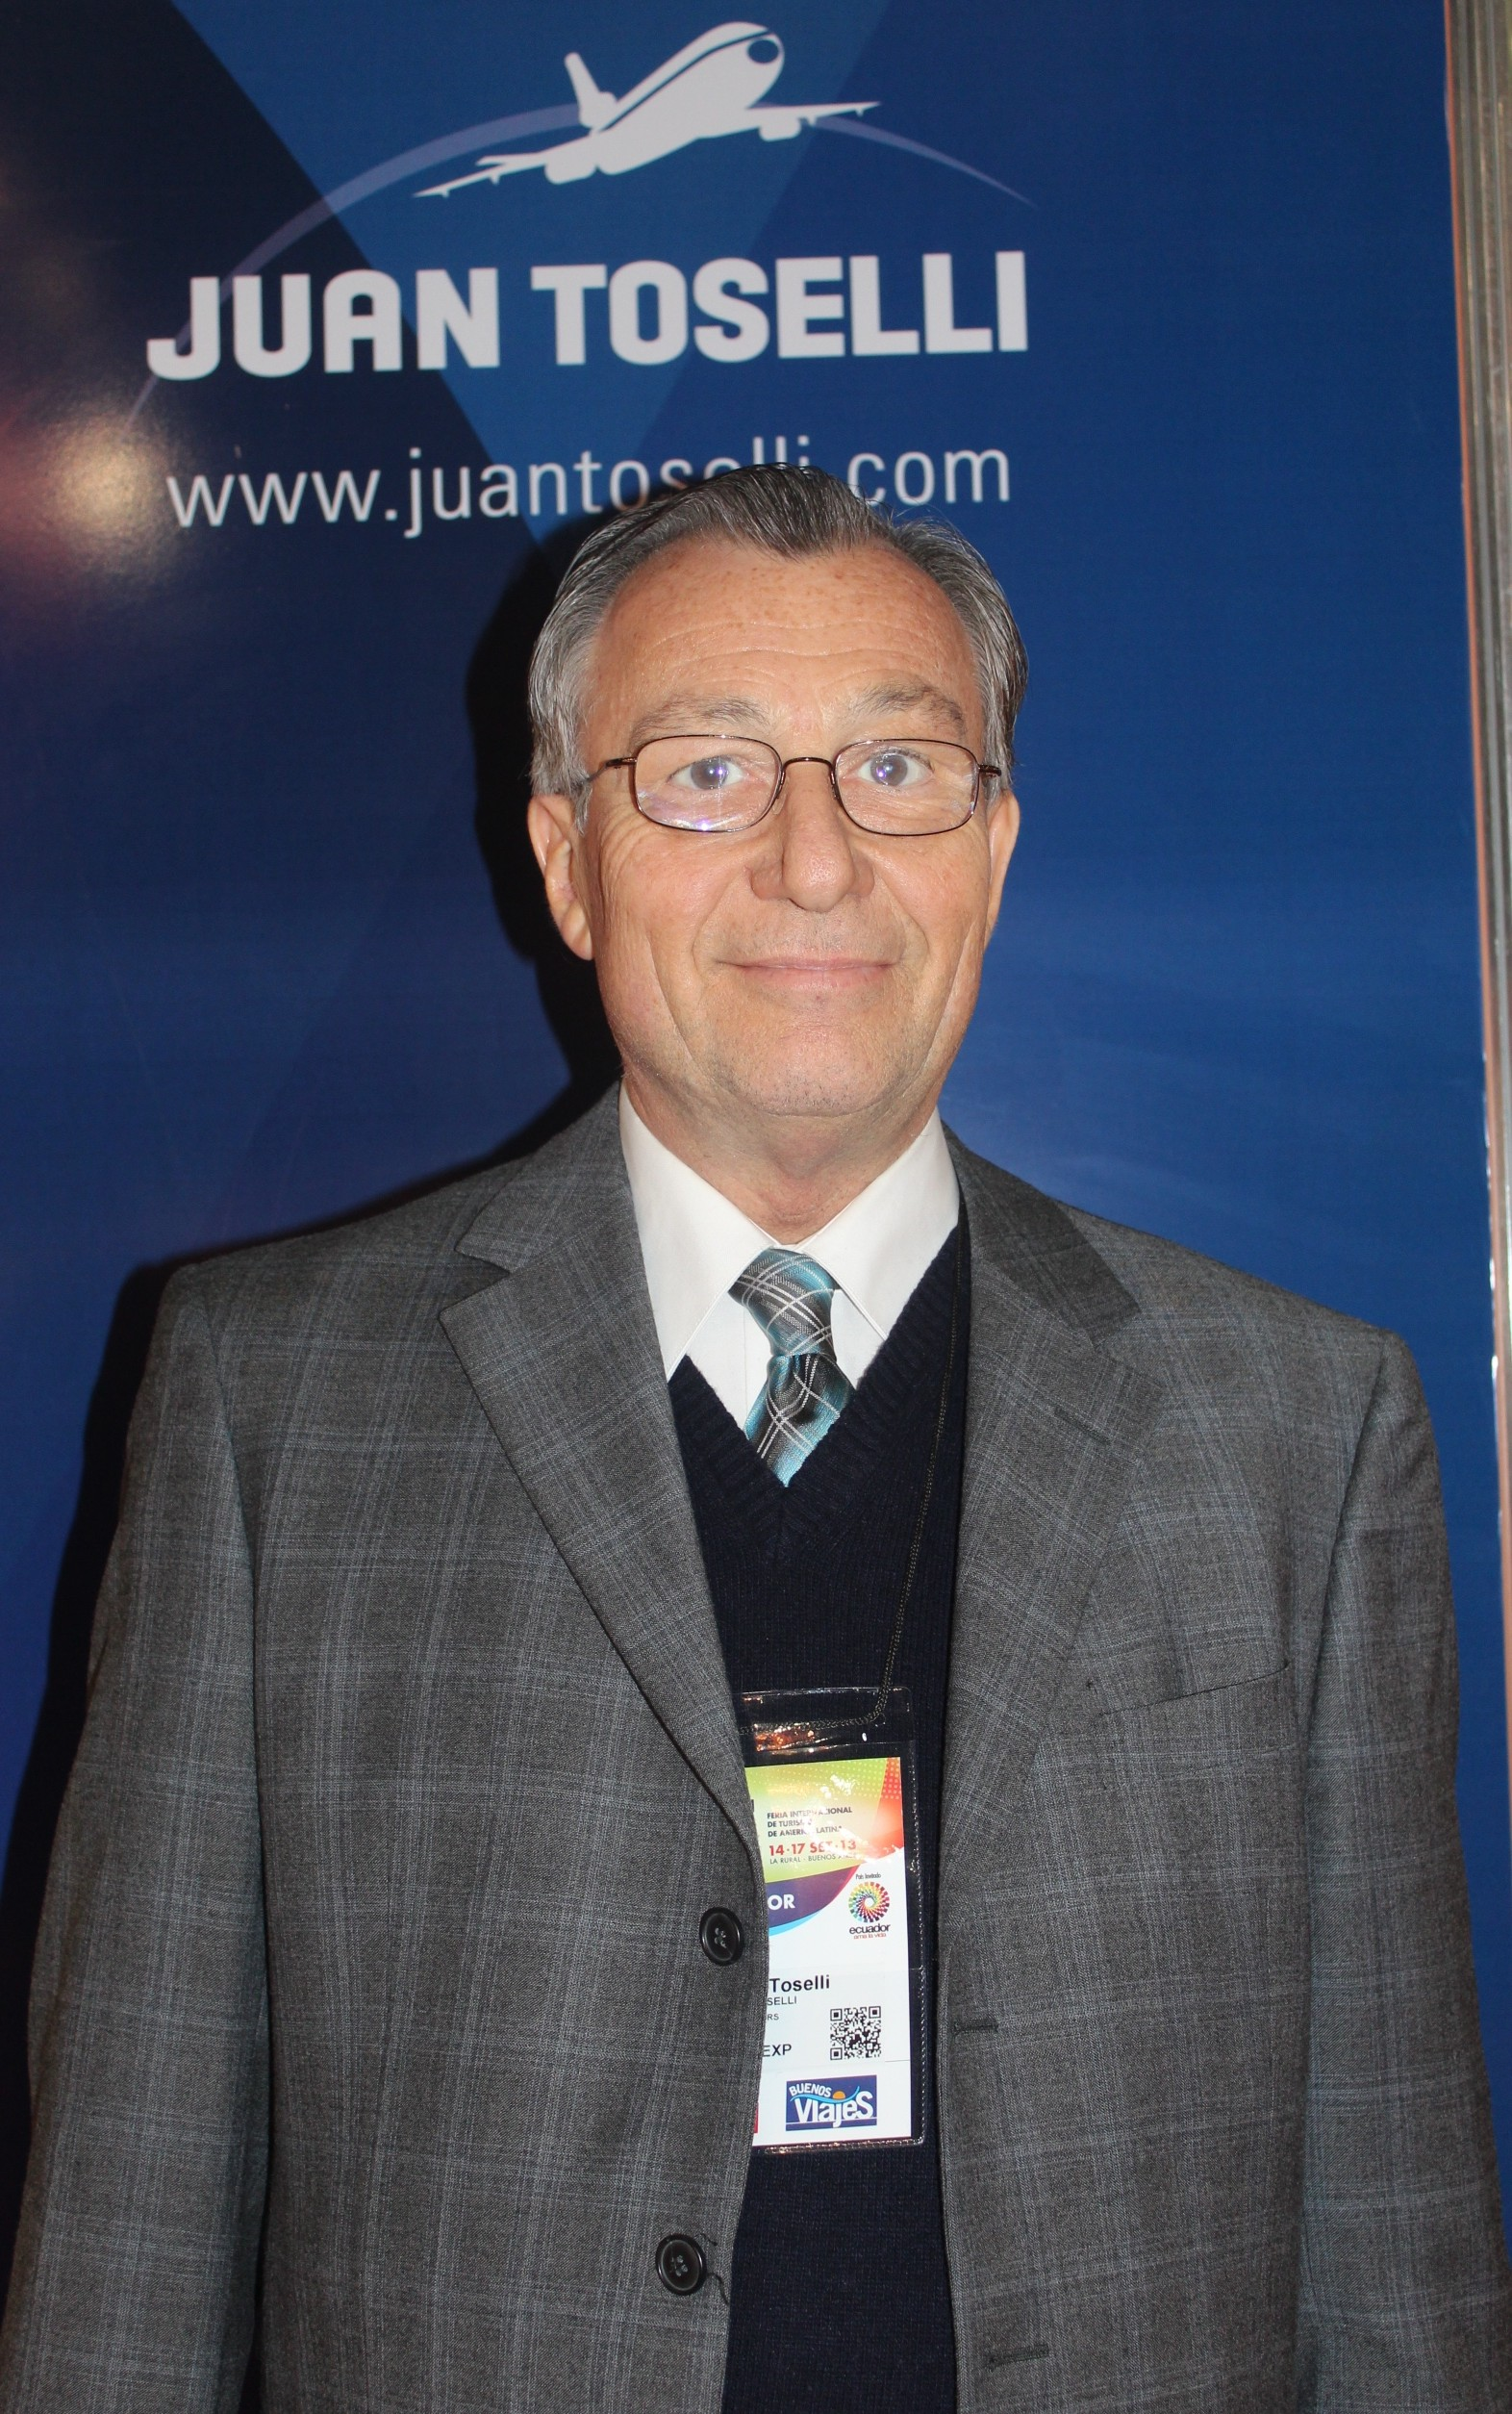 Juan Toselli